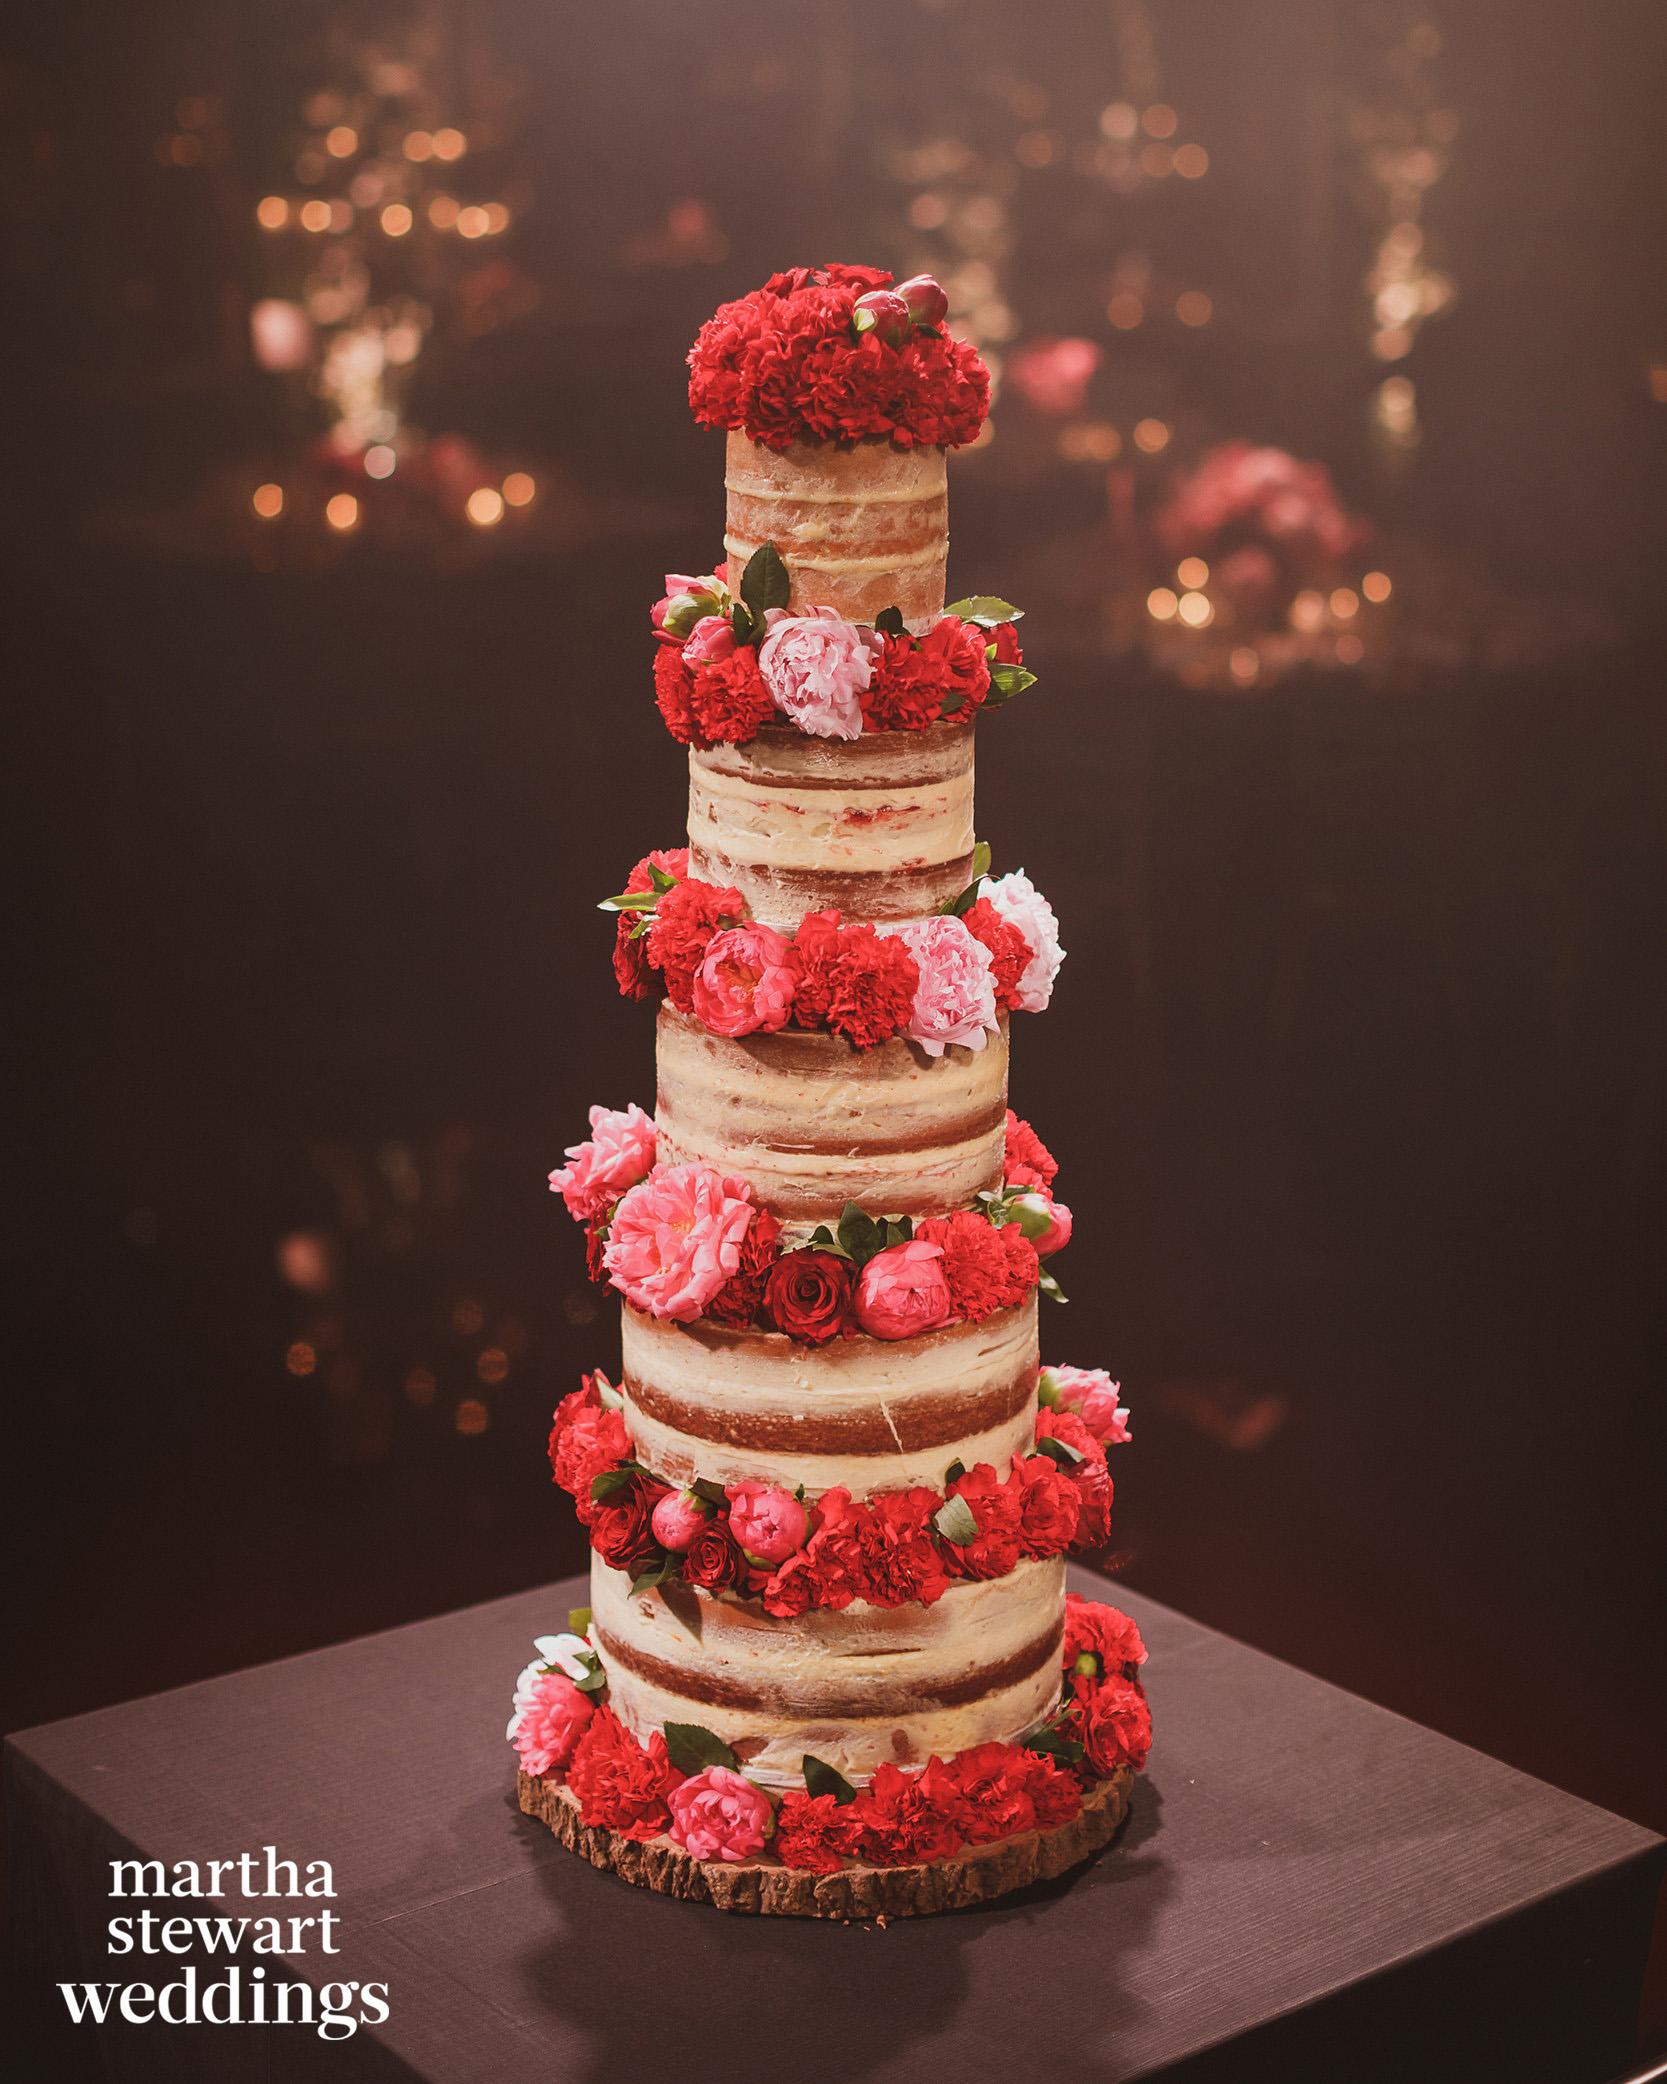 idris elba sabrina elba wedding cake